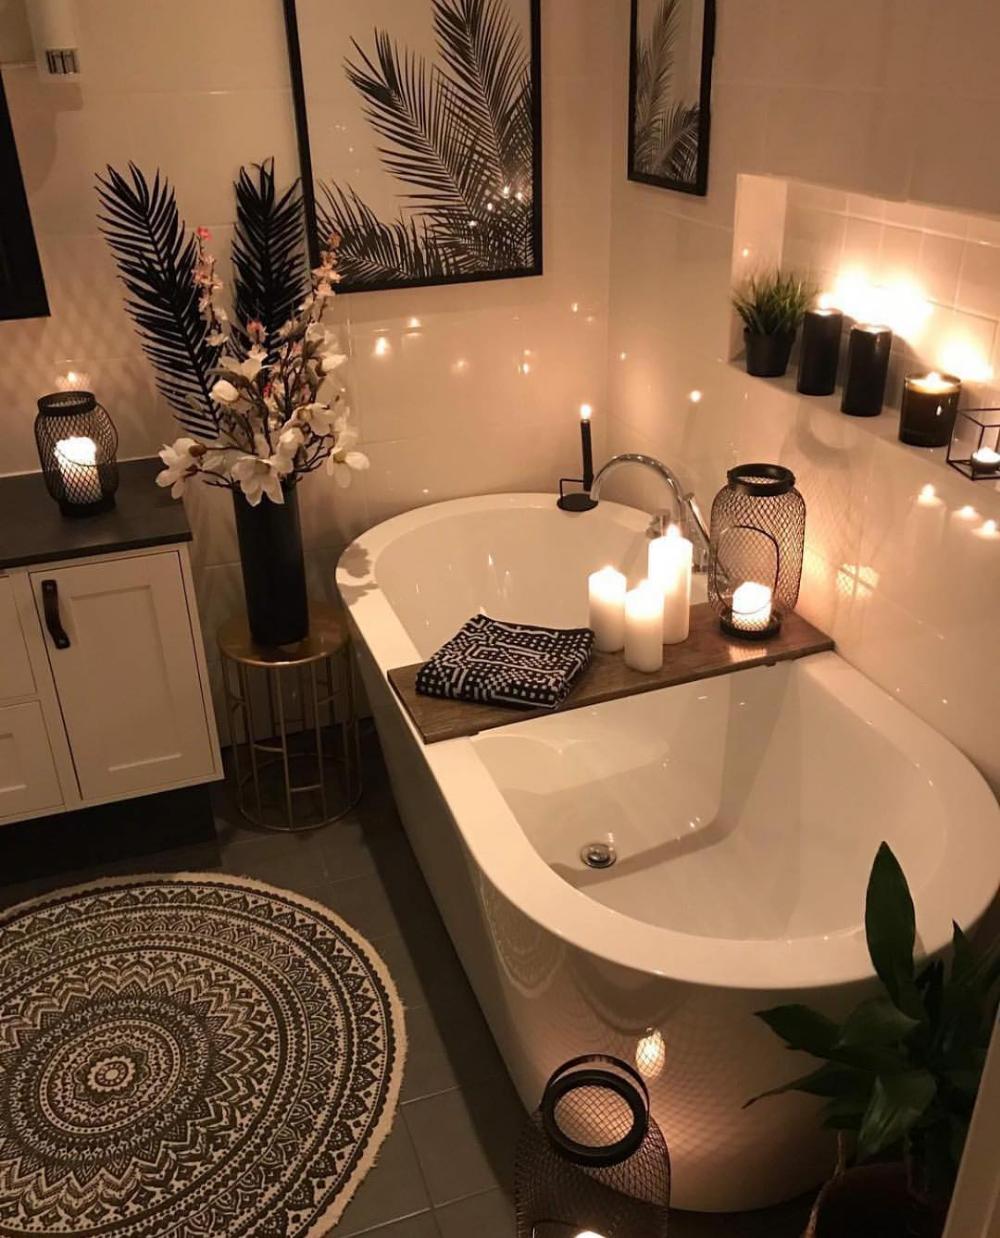 30 Great Small Bathroom With Bathtub Design Ideas You Will Love Isabellestyle Blog Bathtub Design Tree Interior Easy Bathroom Decorating